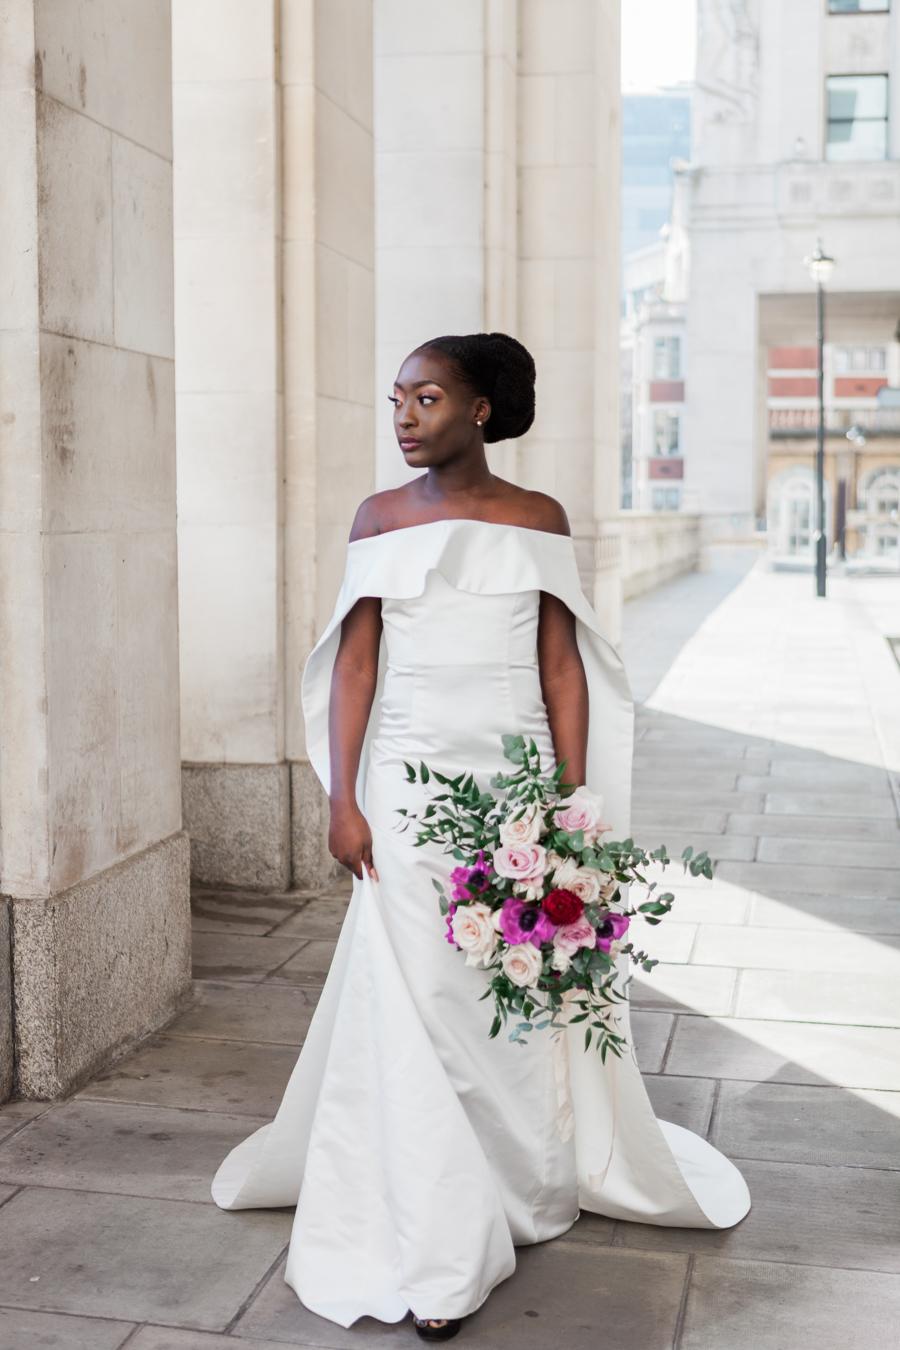 Breathtakingly beautiful - diversity wins in this stunning RSA London wedding editorial! (18)